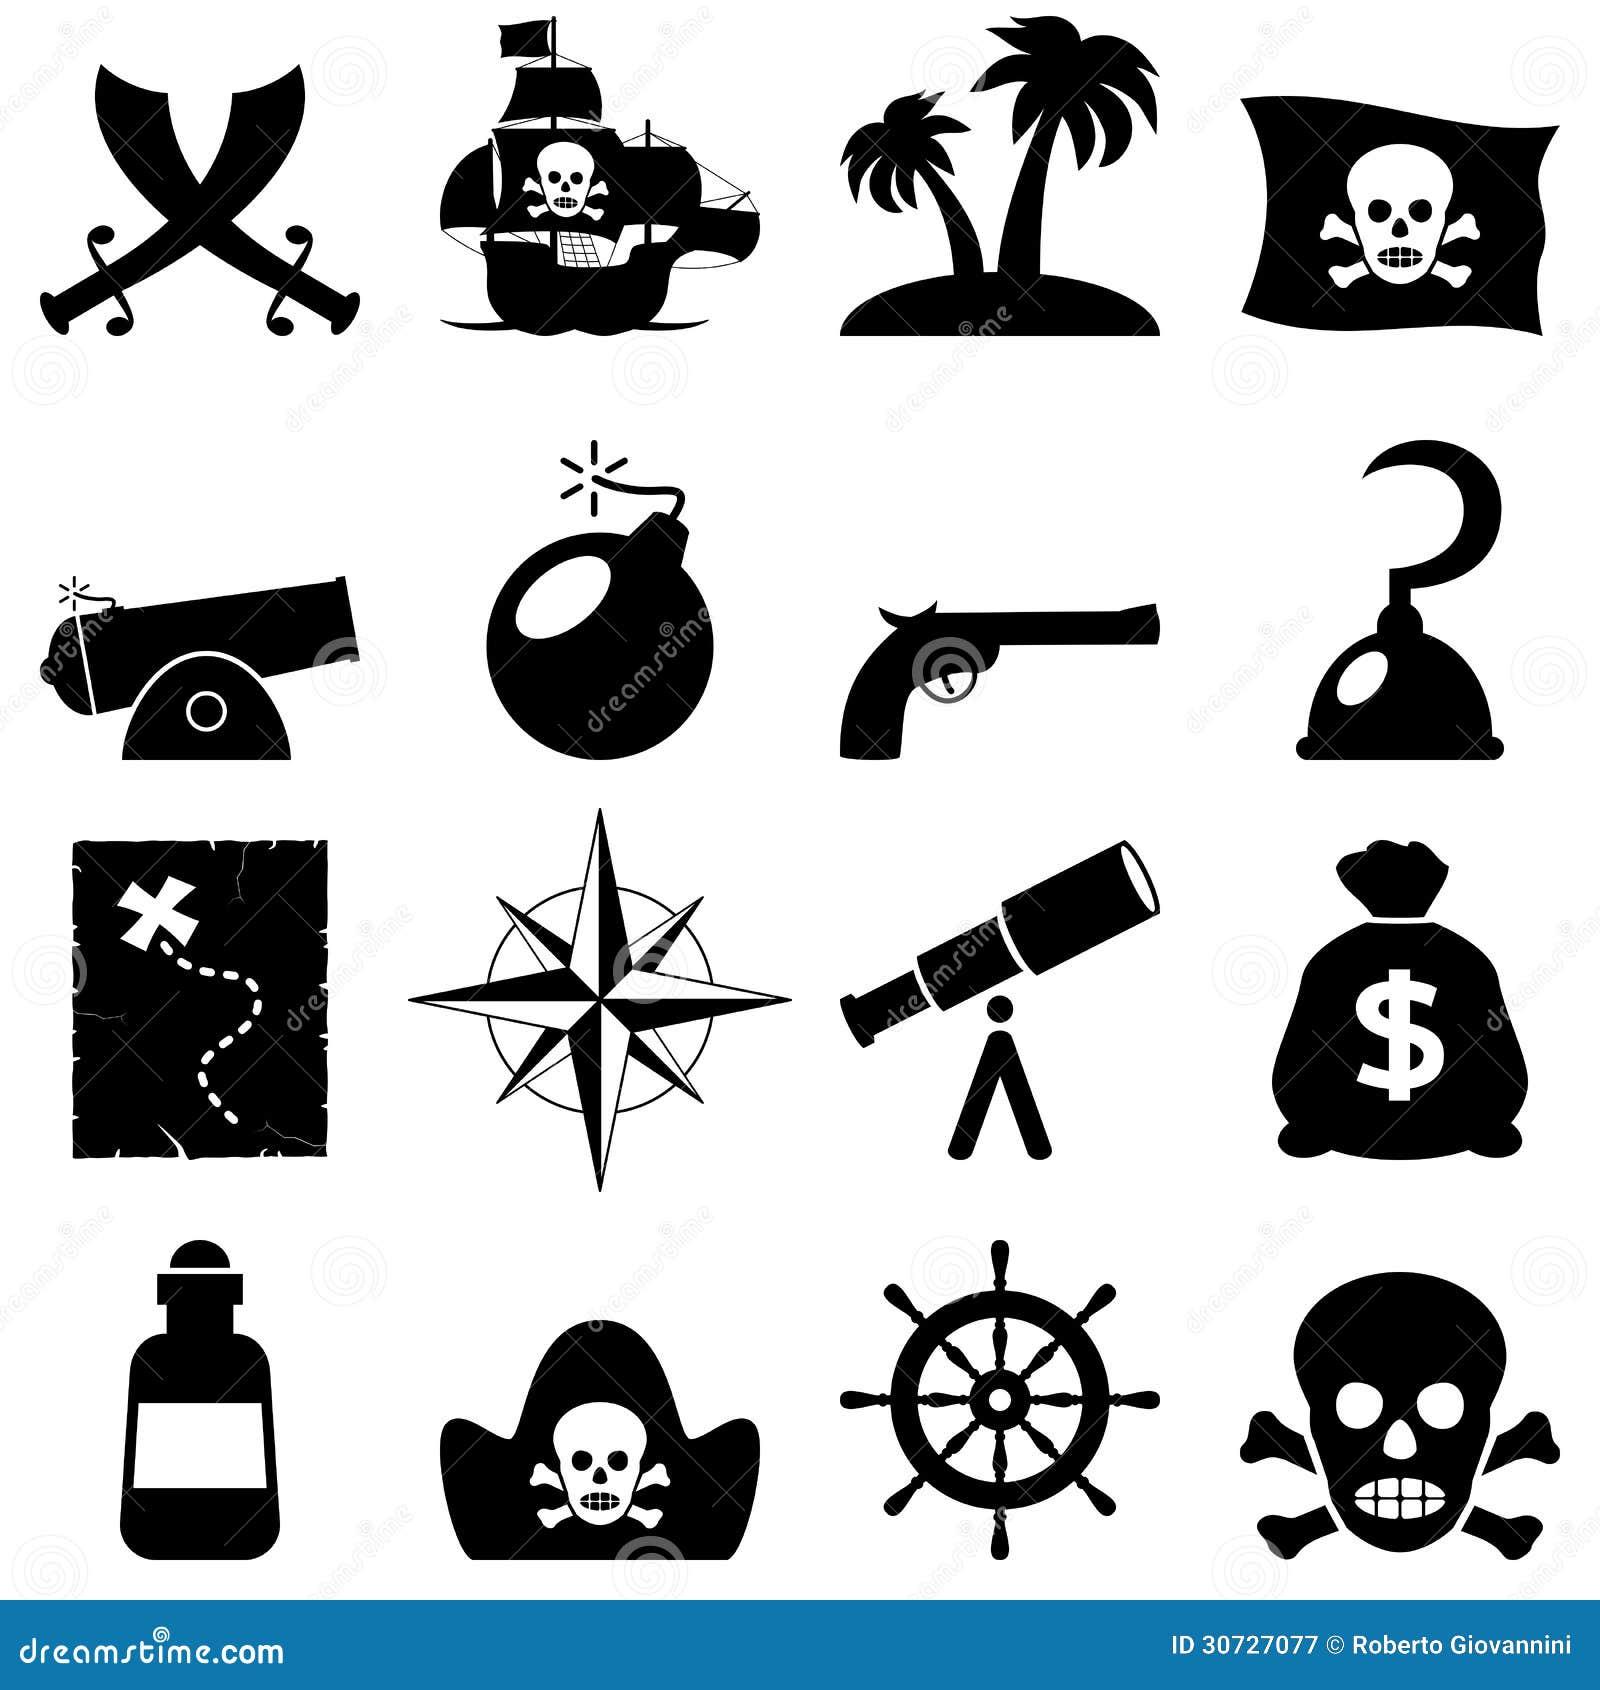 Pirates Black And White Icons Illustration 30727077 Megapixl